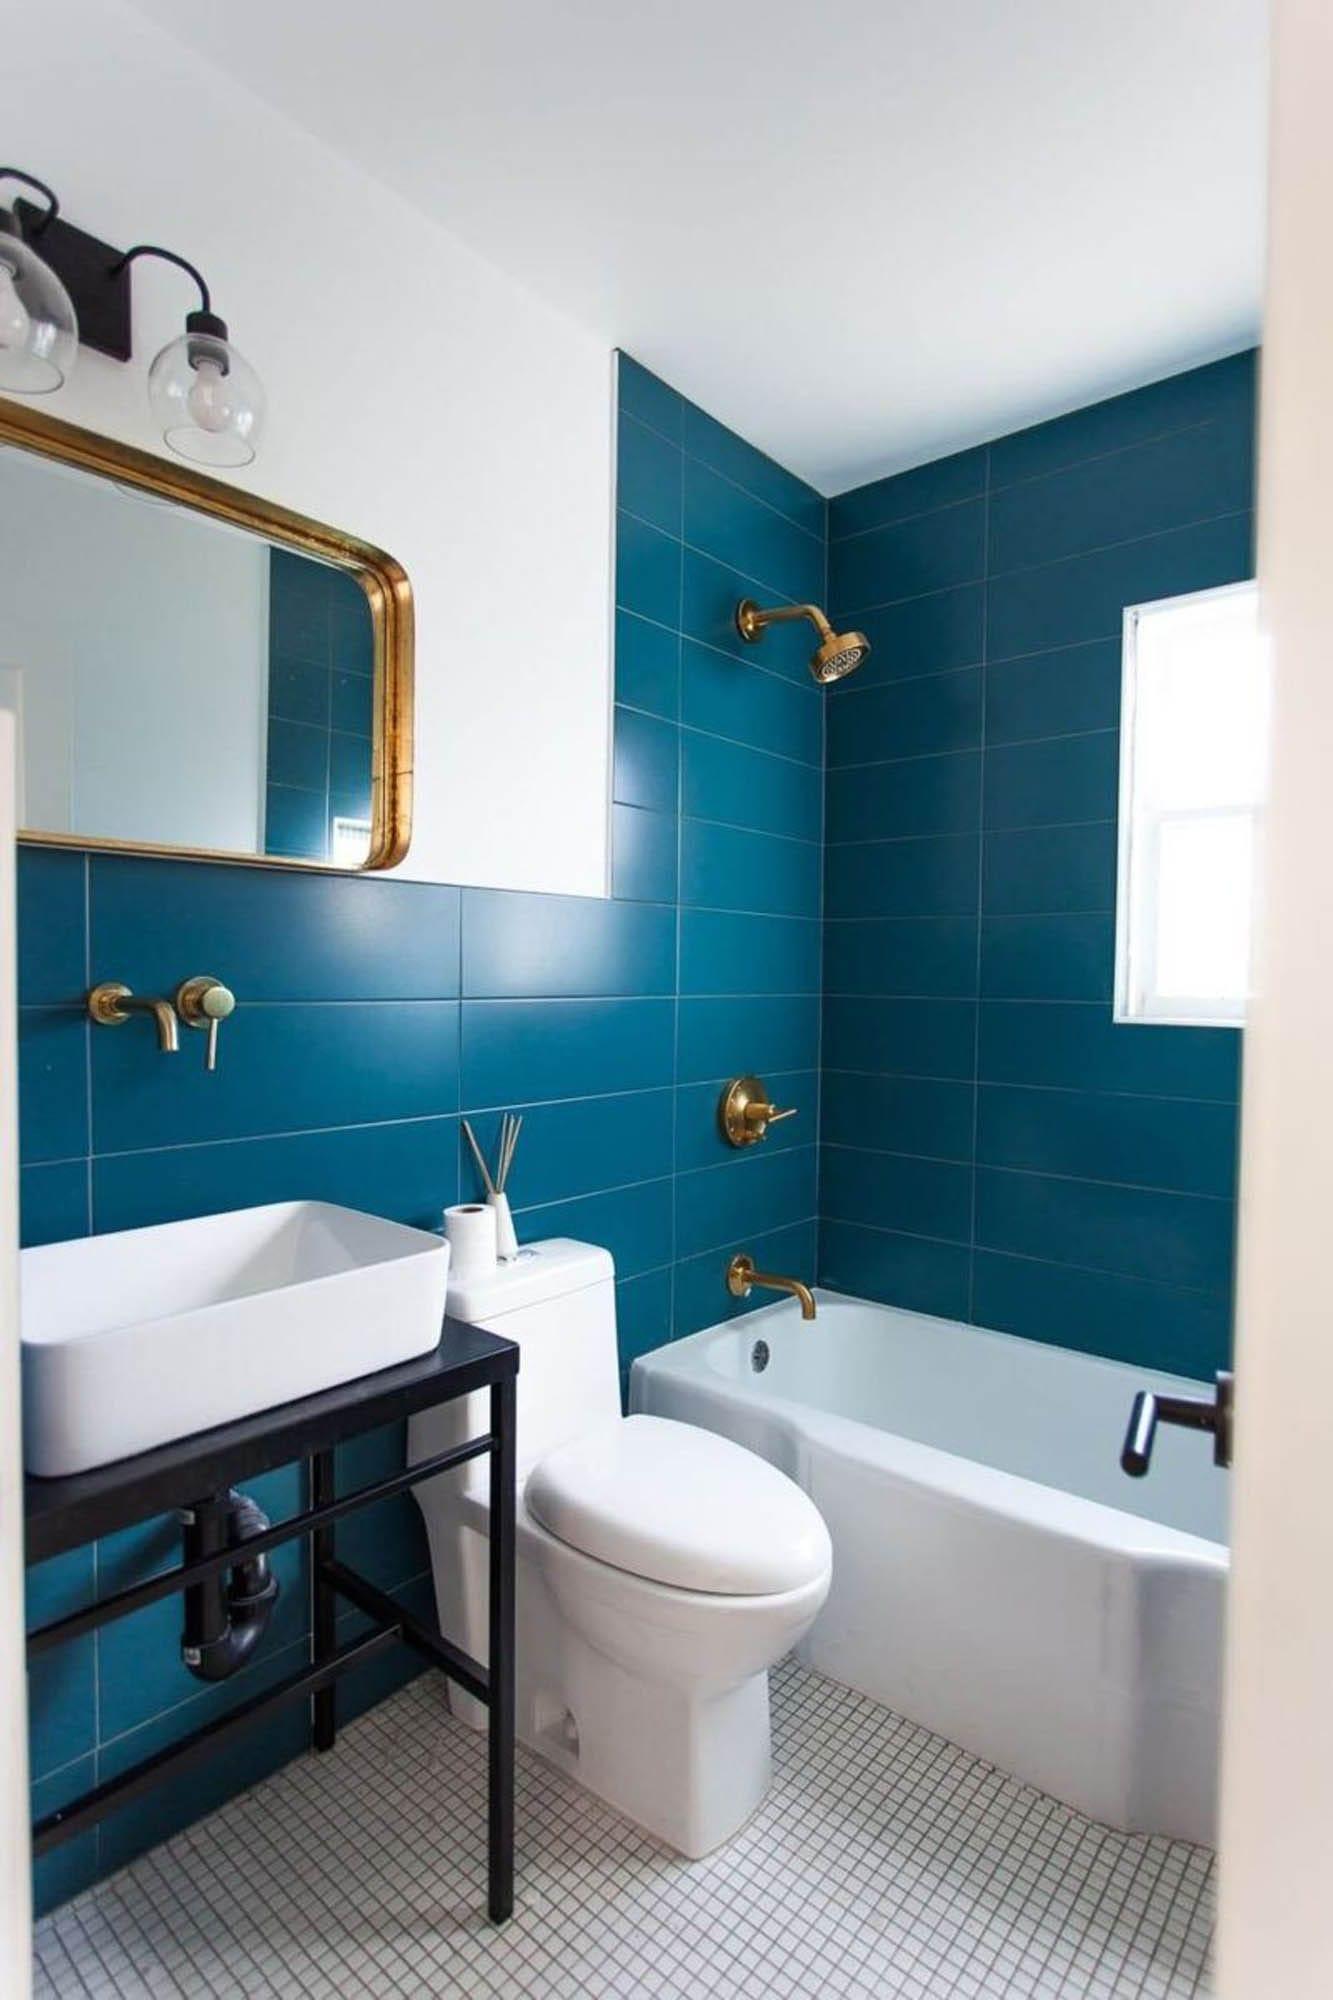 Bold blue wall tiles